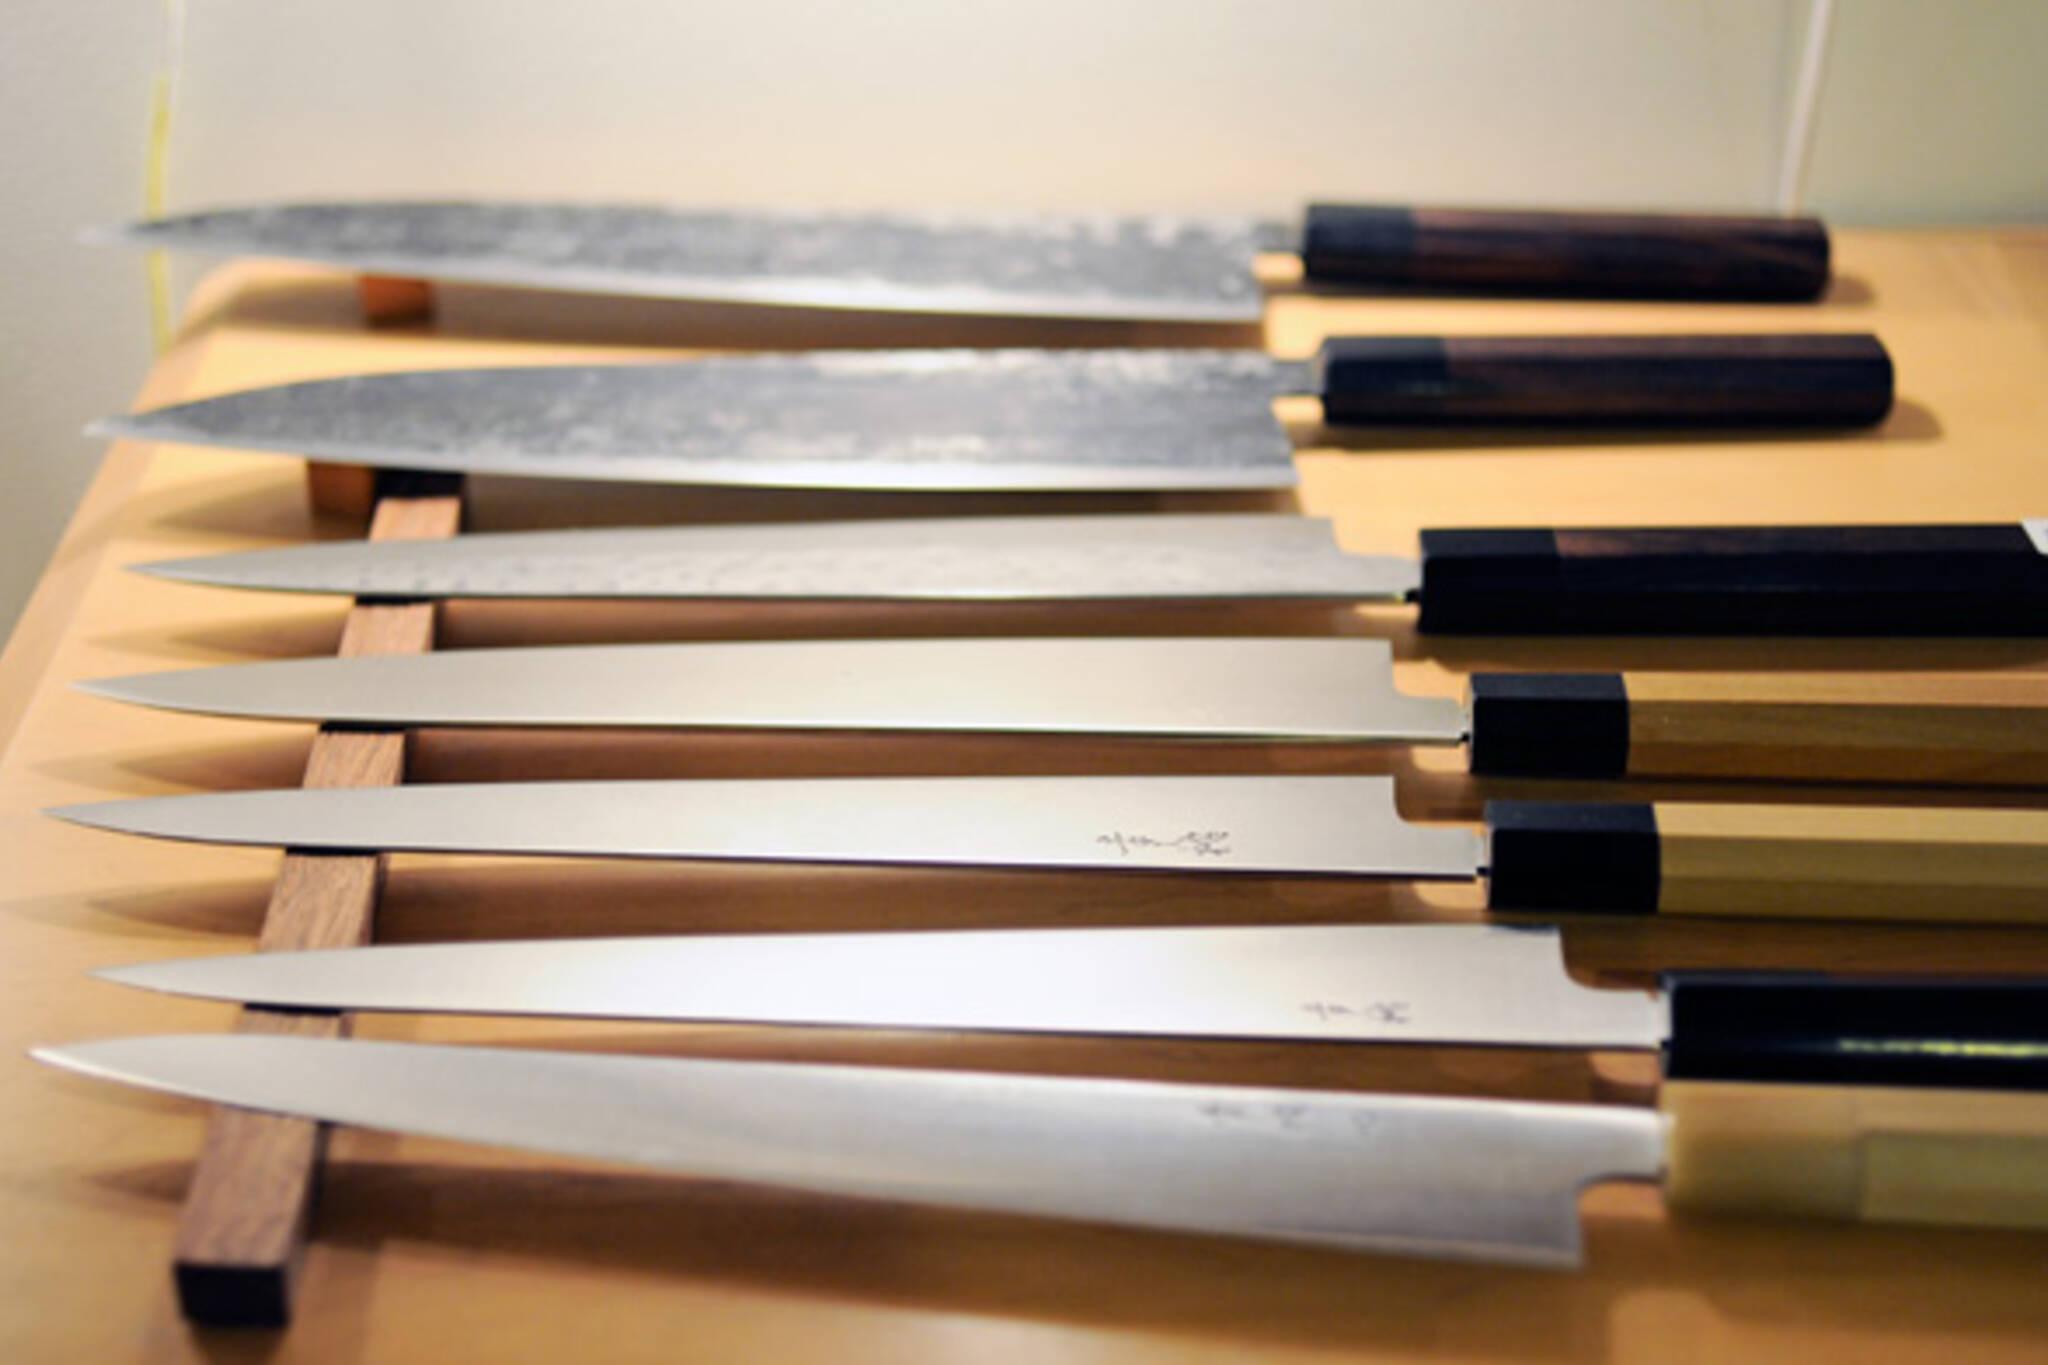 Japanese Knives Toronto